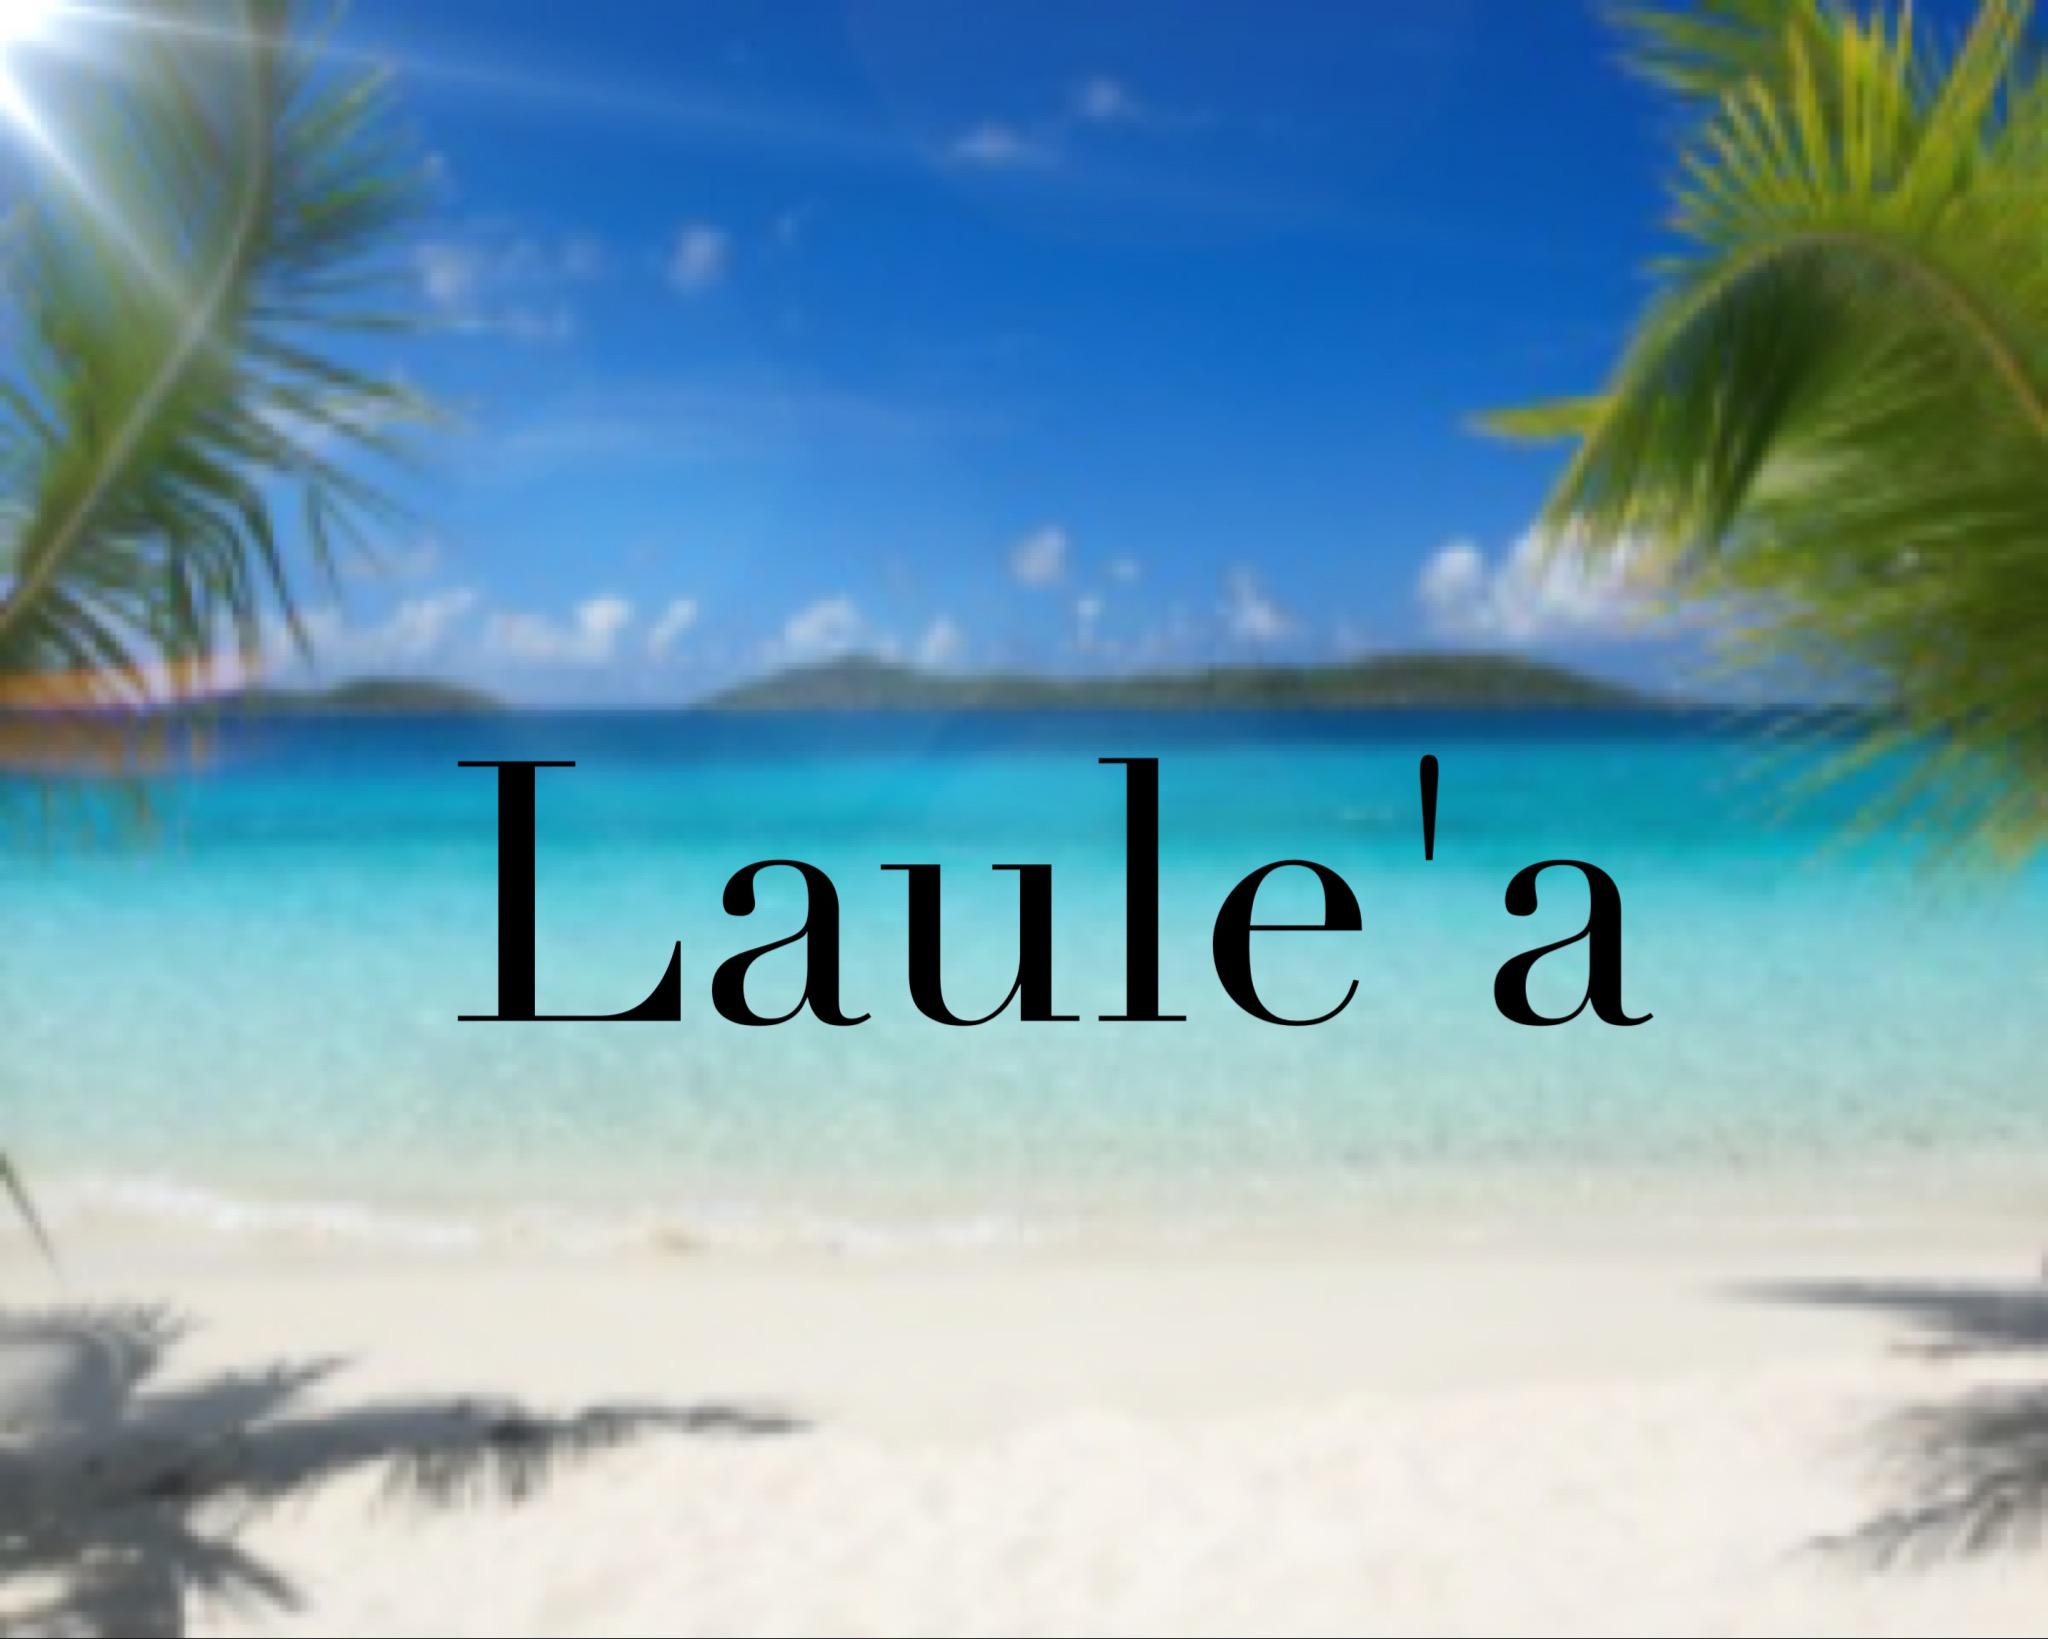 laulea25k